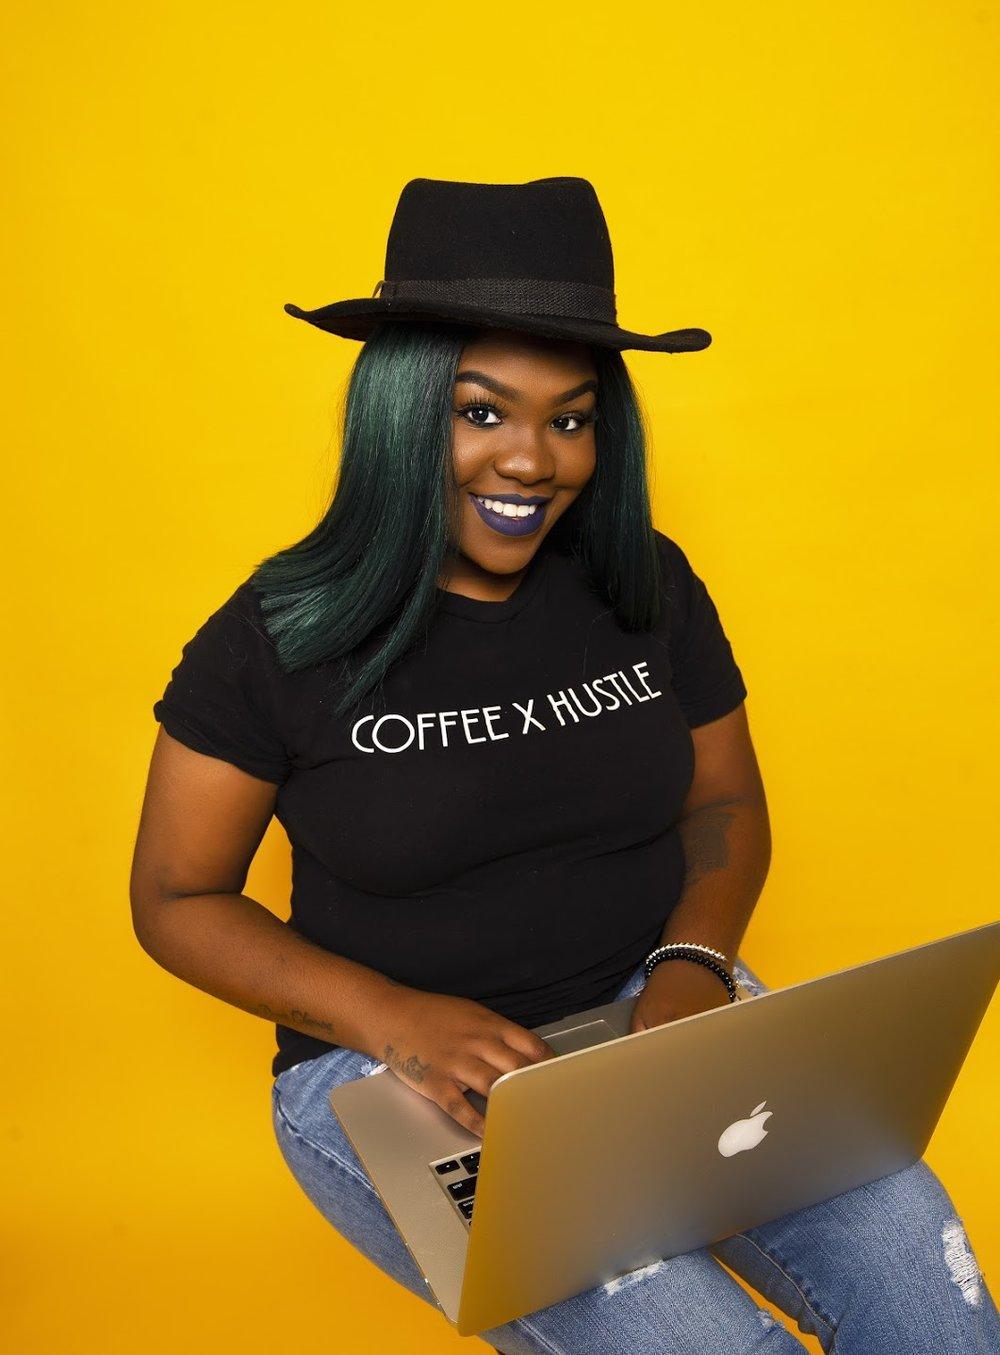 Photo: Coffee x Hustle